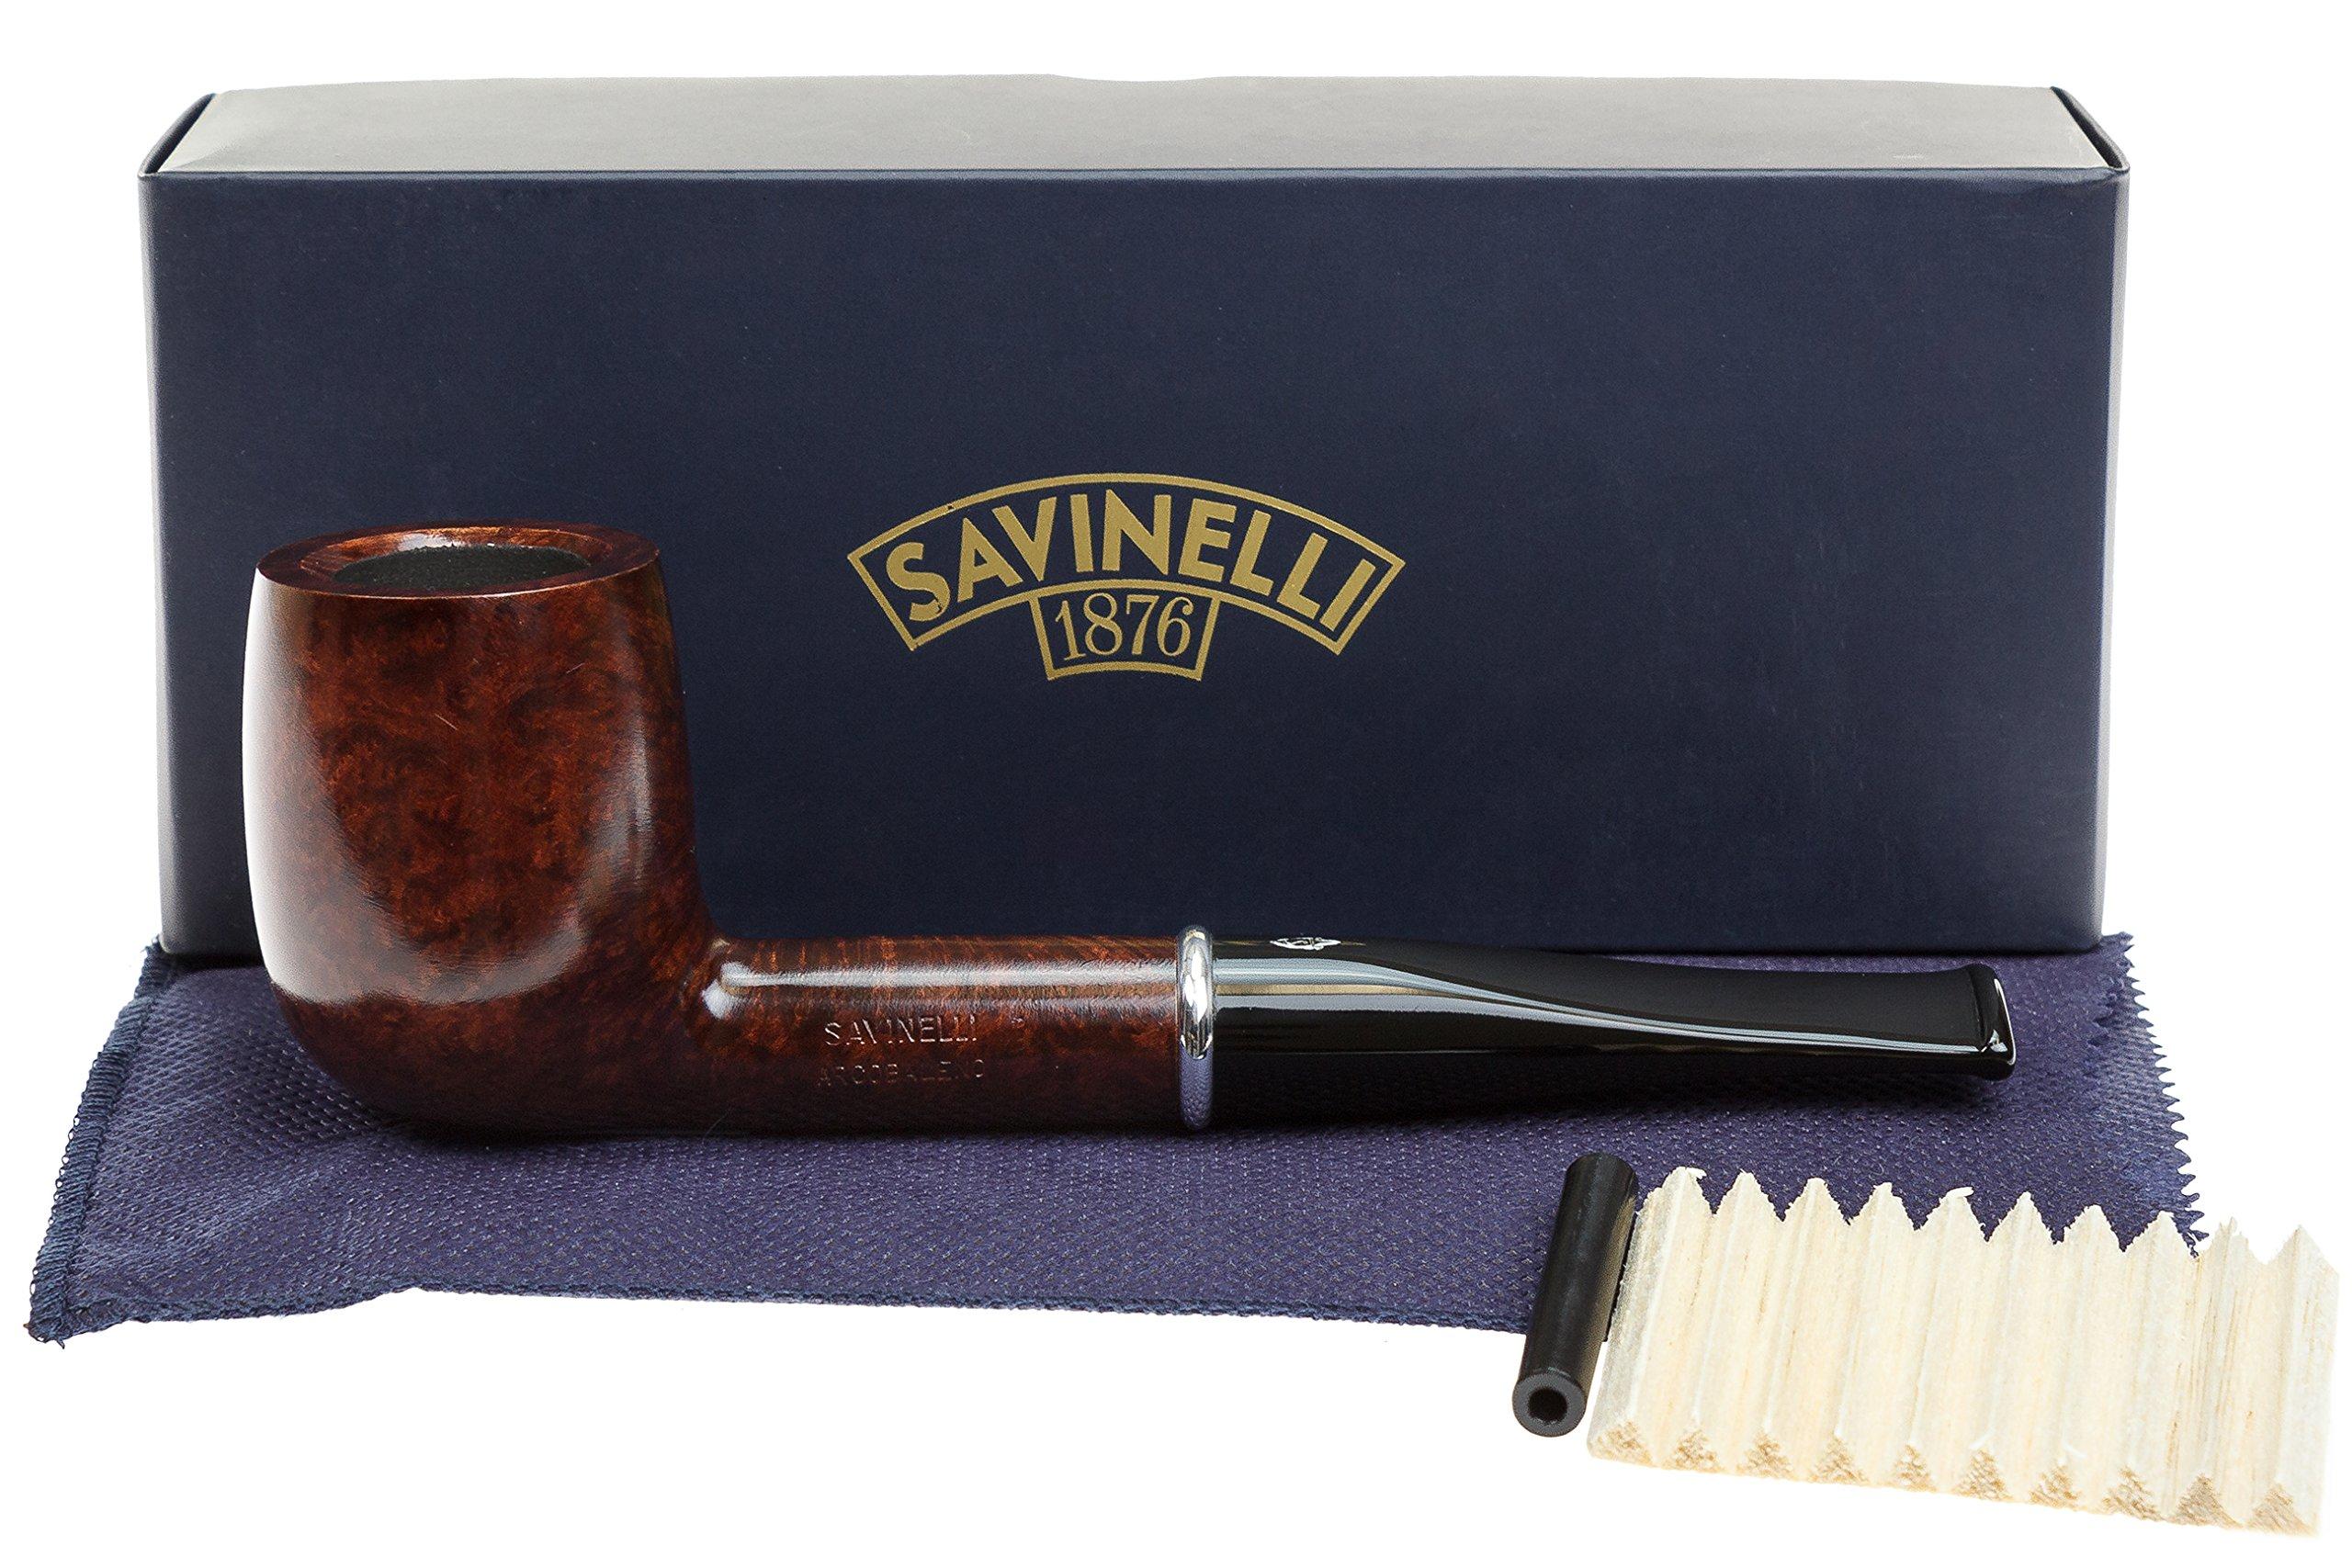 Savinelli Arcobaleno 111 Brown Tobacco Pipe - Smooth